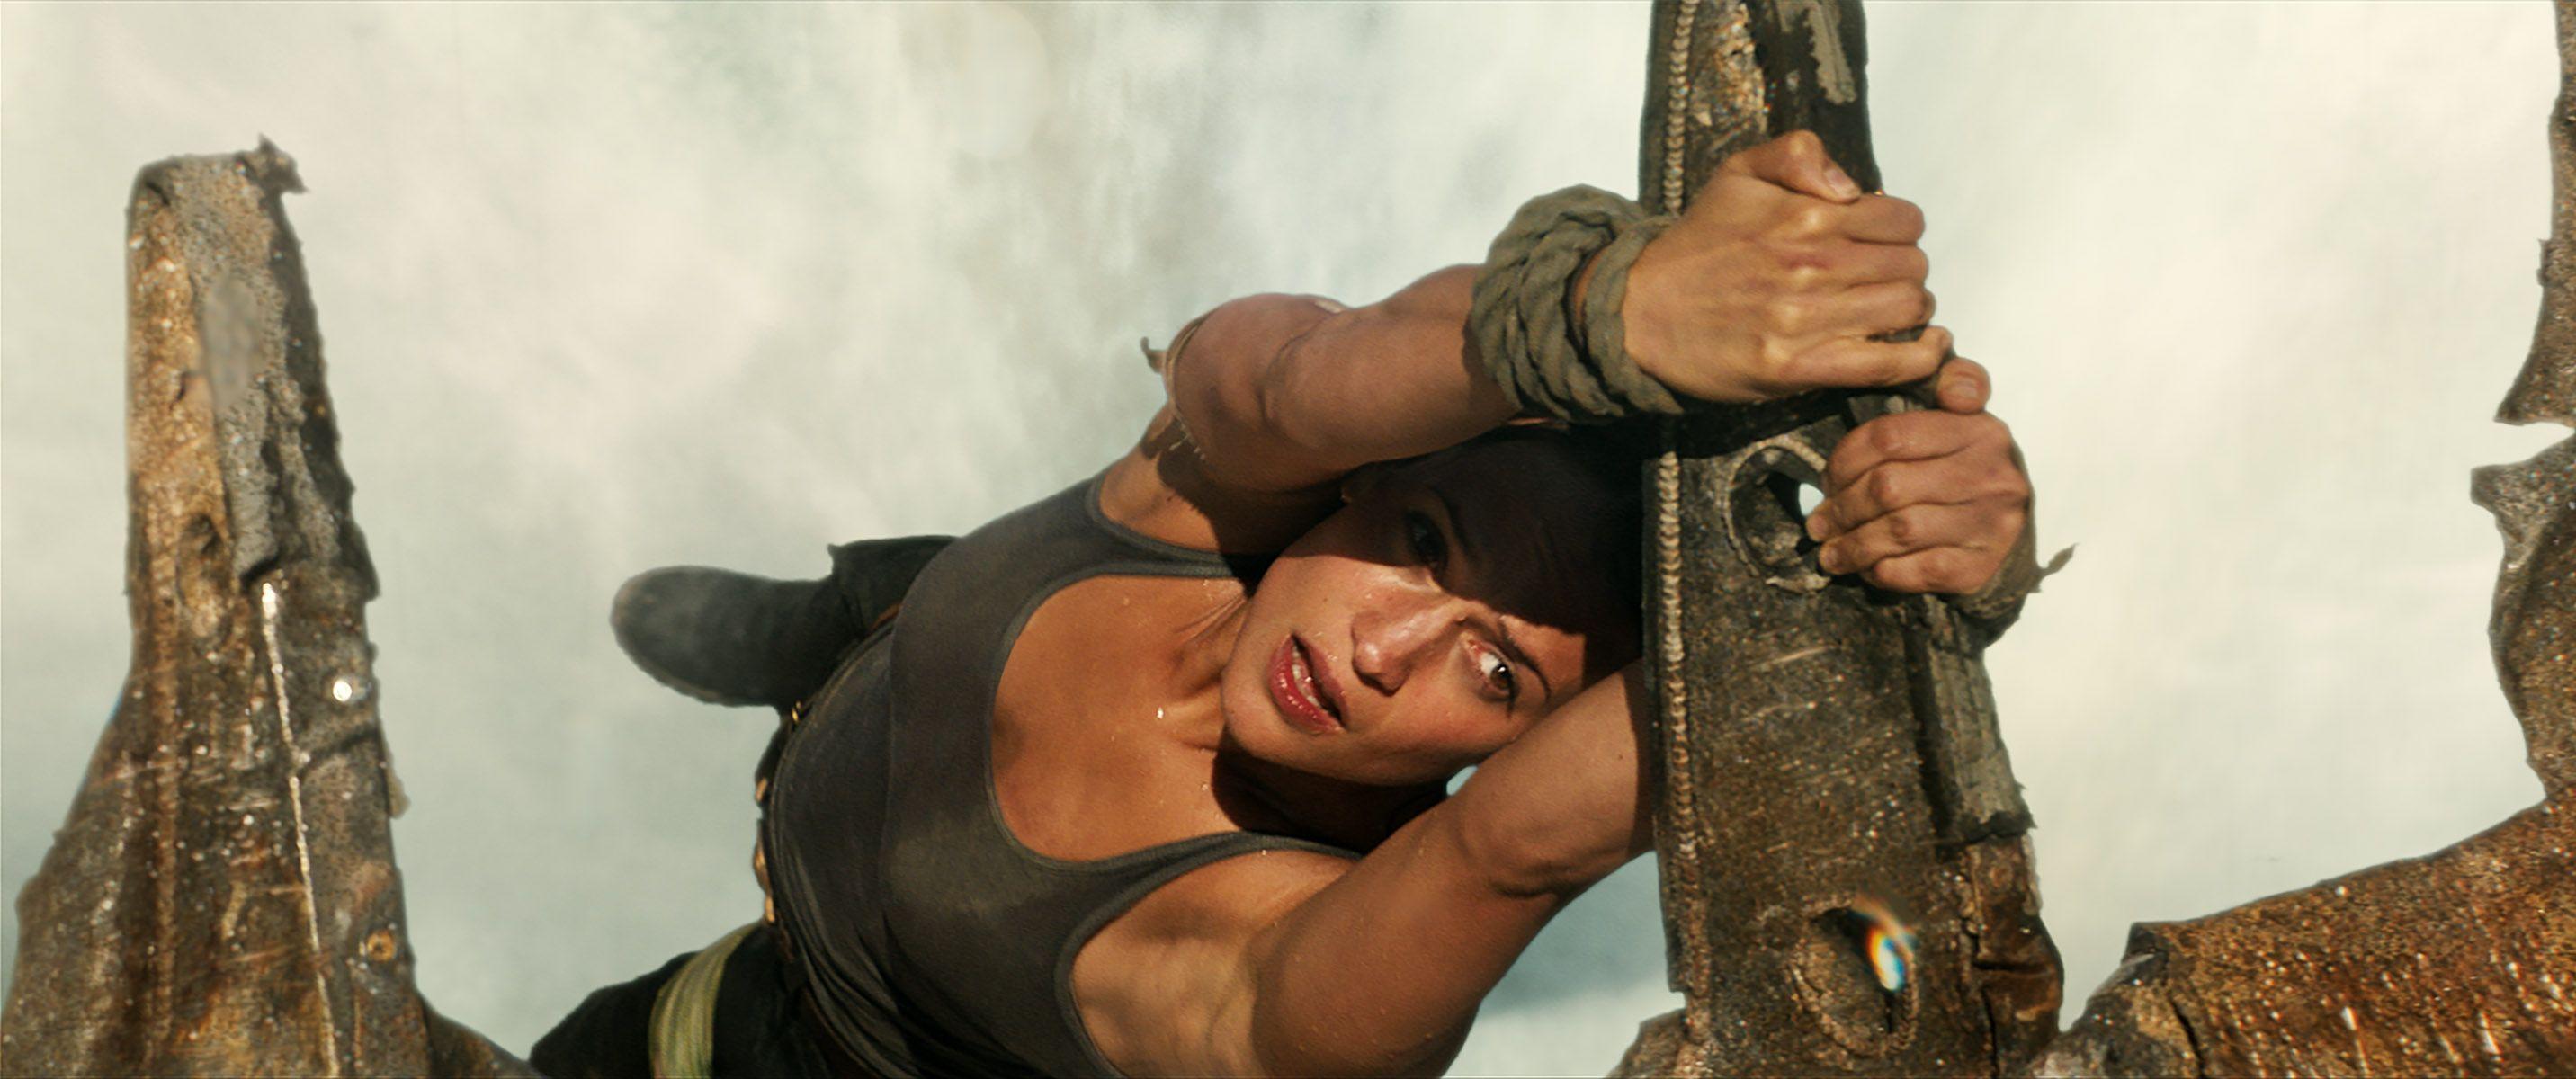 Walton Goggins >> New Tomb Raider Images Find Alicia Vikander in Action   Collider